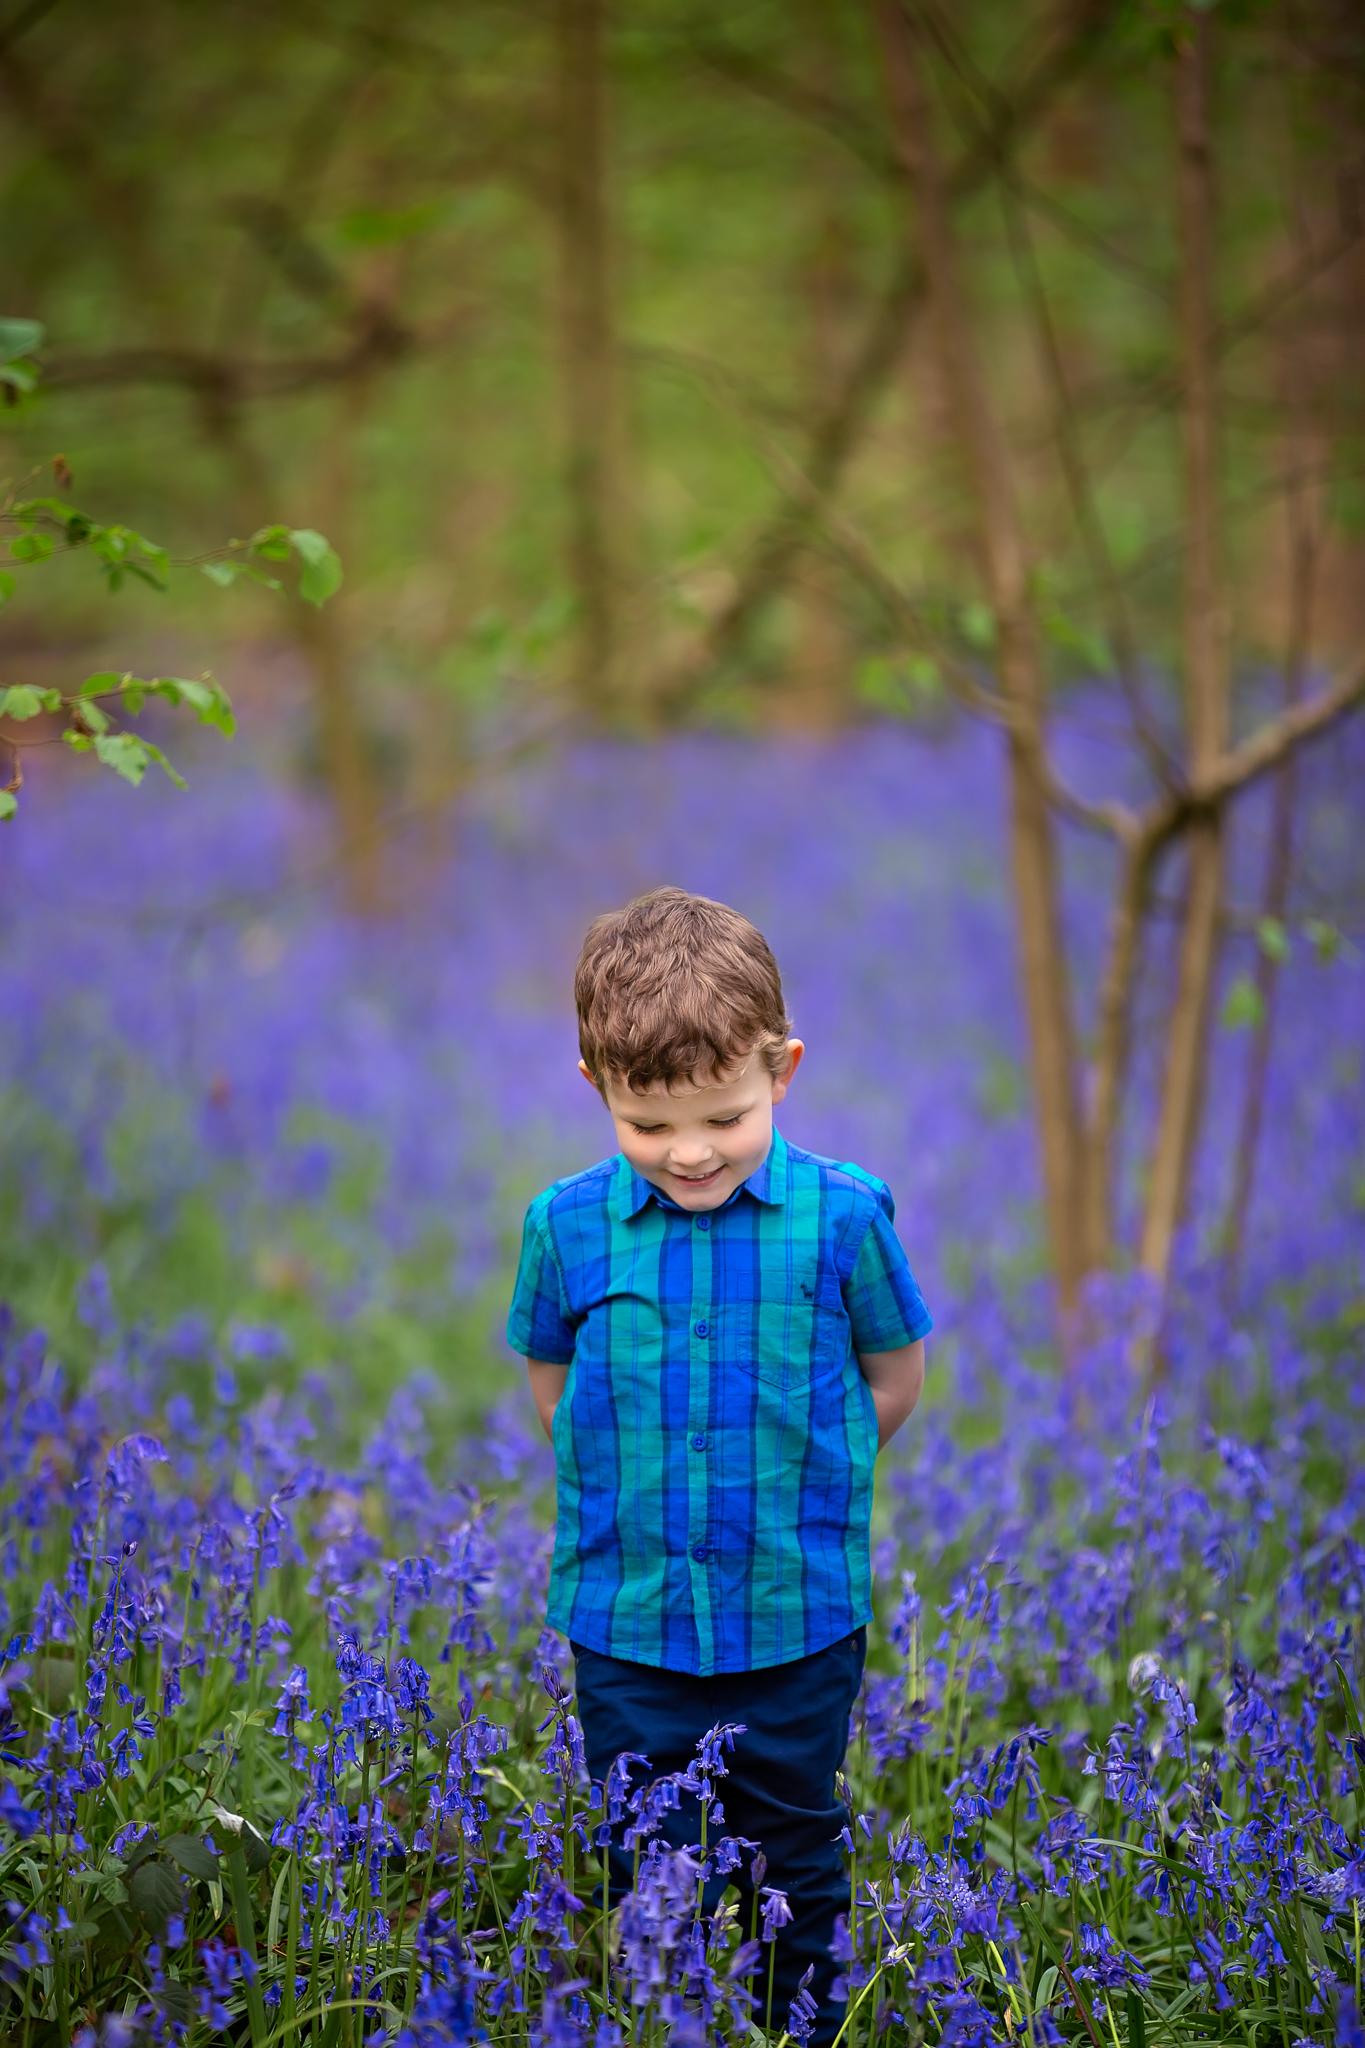 Child photography Leeds, York, Harrogare, Bradford: cute little boy walking though a bluebell wood